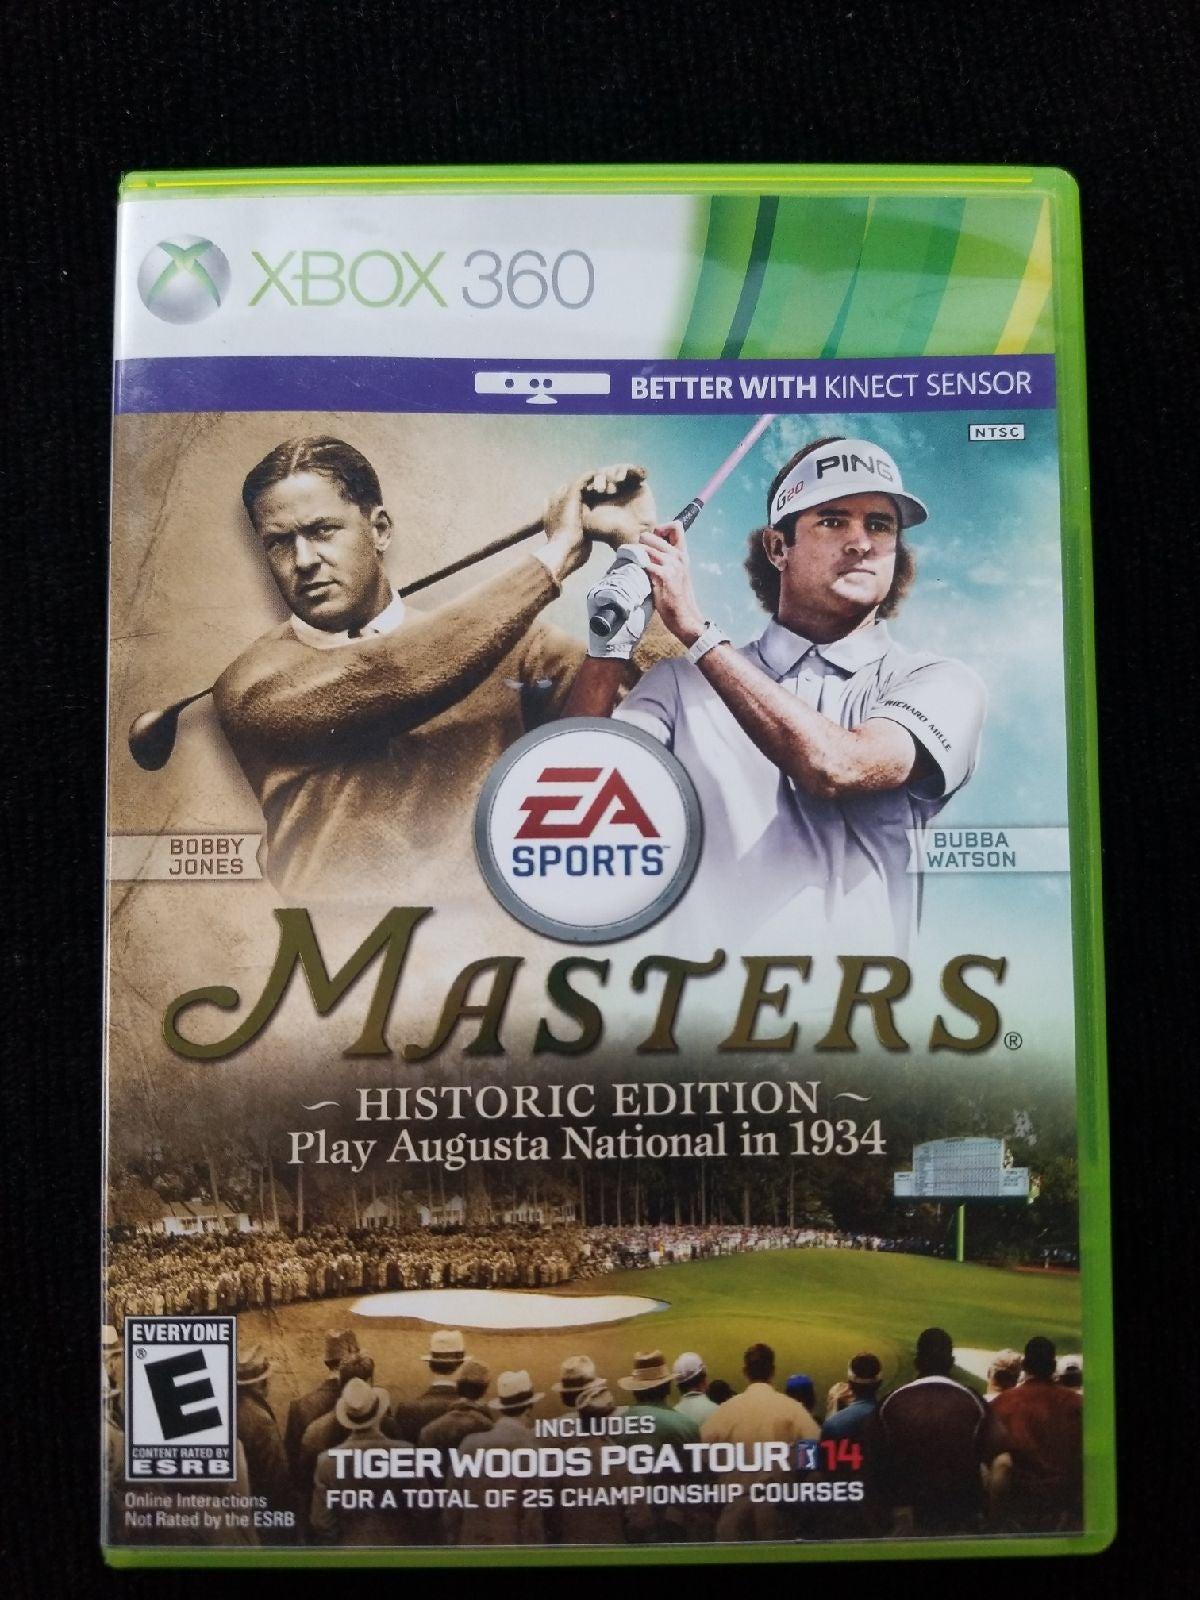 Tiger Woods PGA Tour 14 Historic Edition